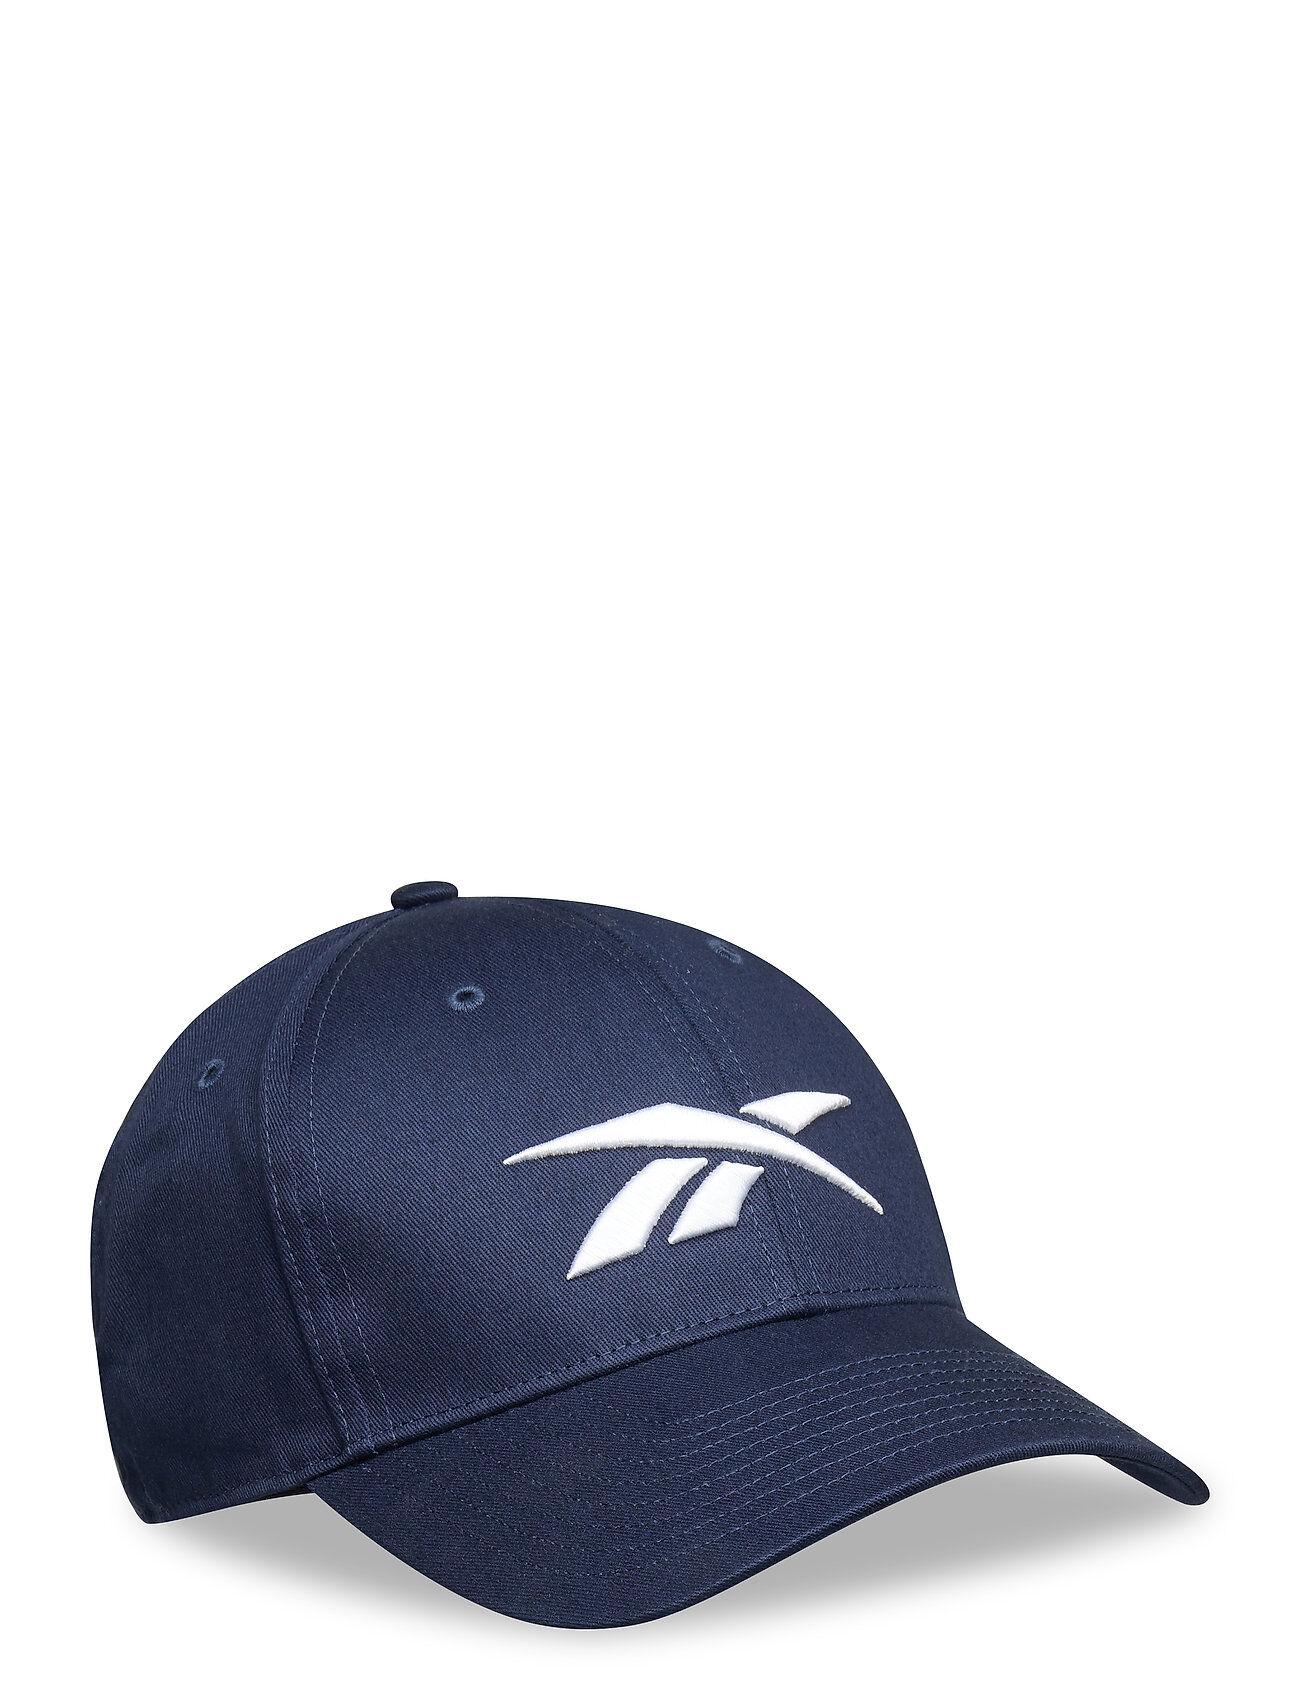 Reebok Performance Ubf Baseb Cap Accessories Headwear Caps Sininen Reebok Performance